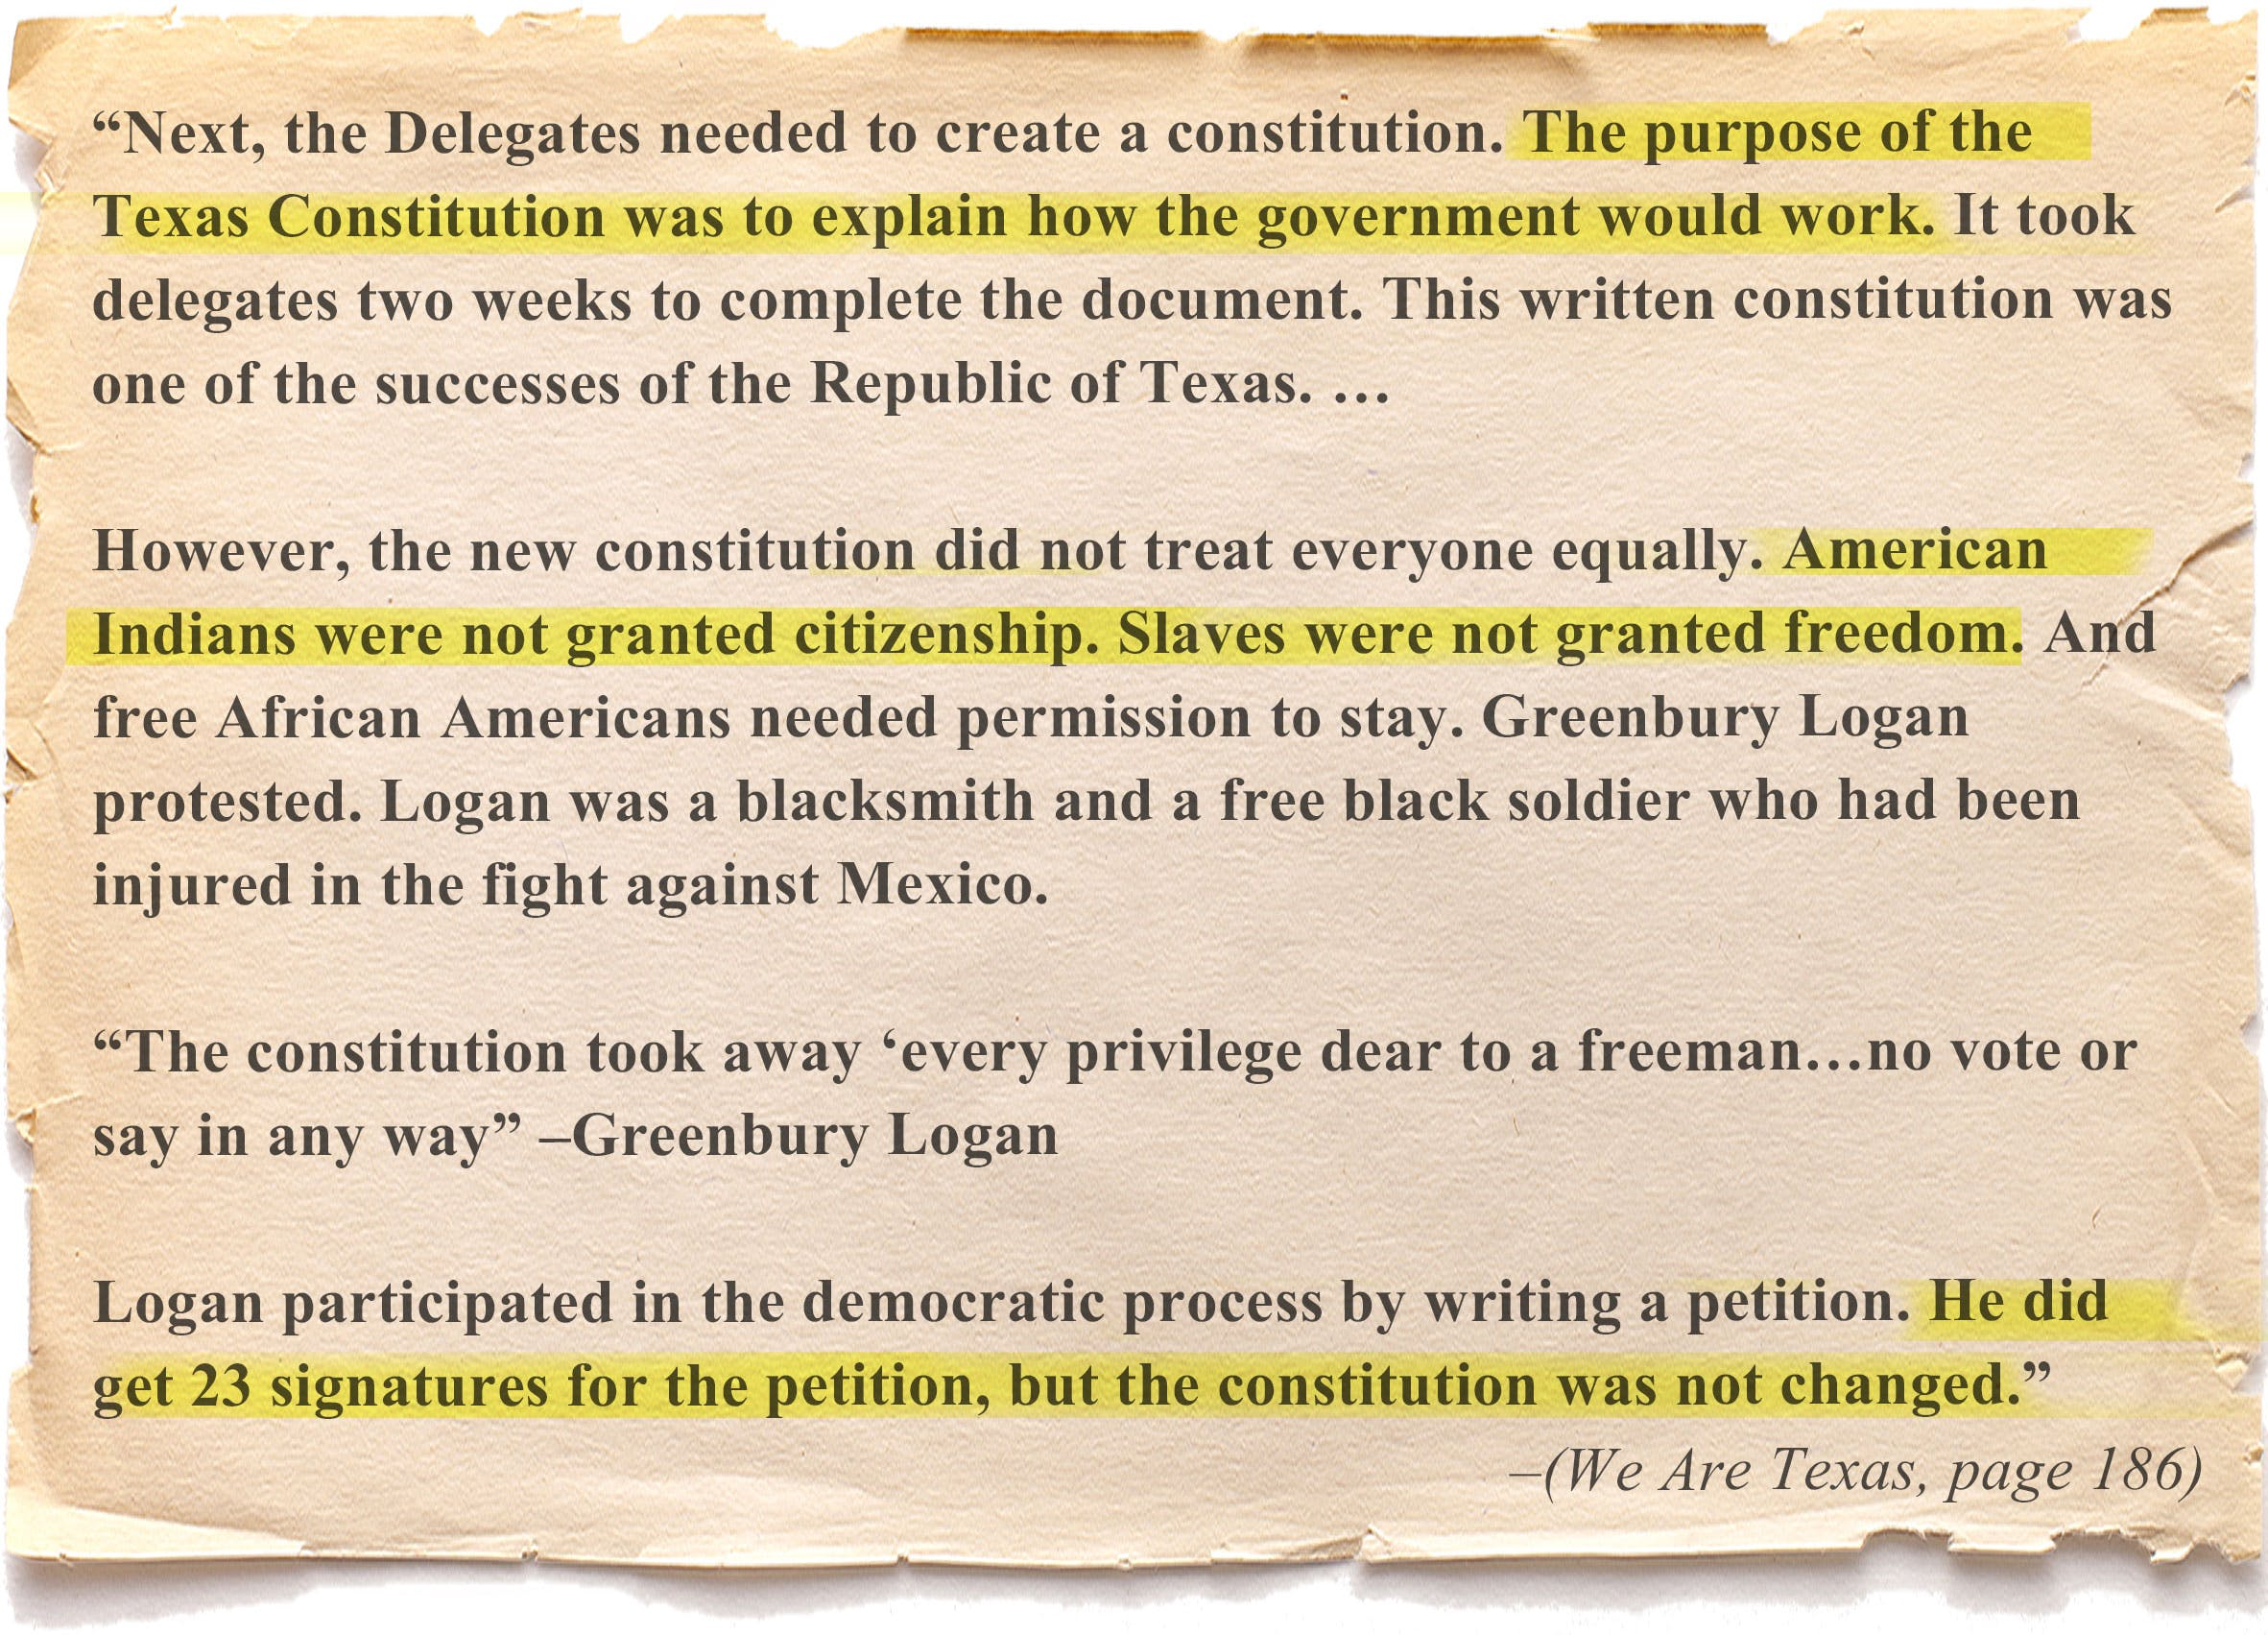 texas-history-constitution-slavery-freedom